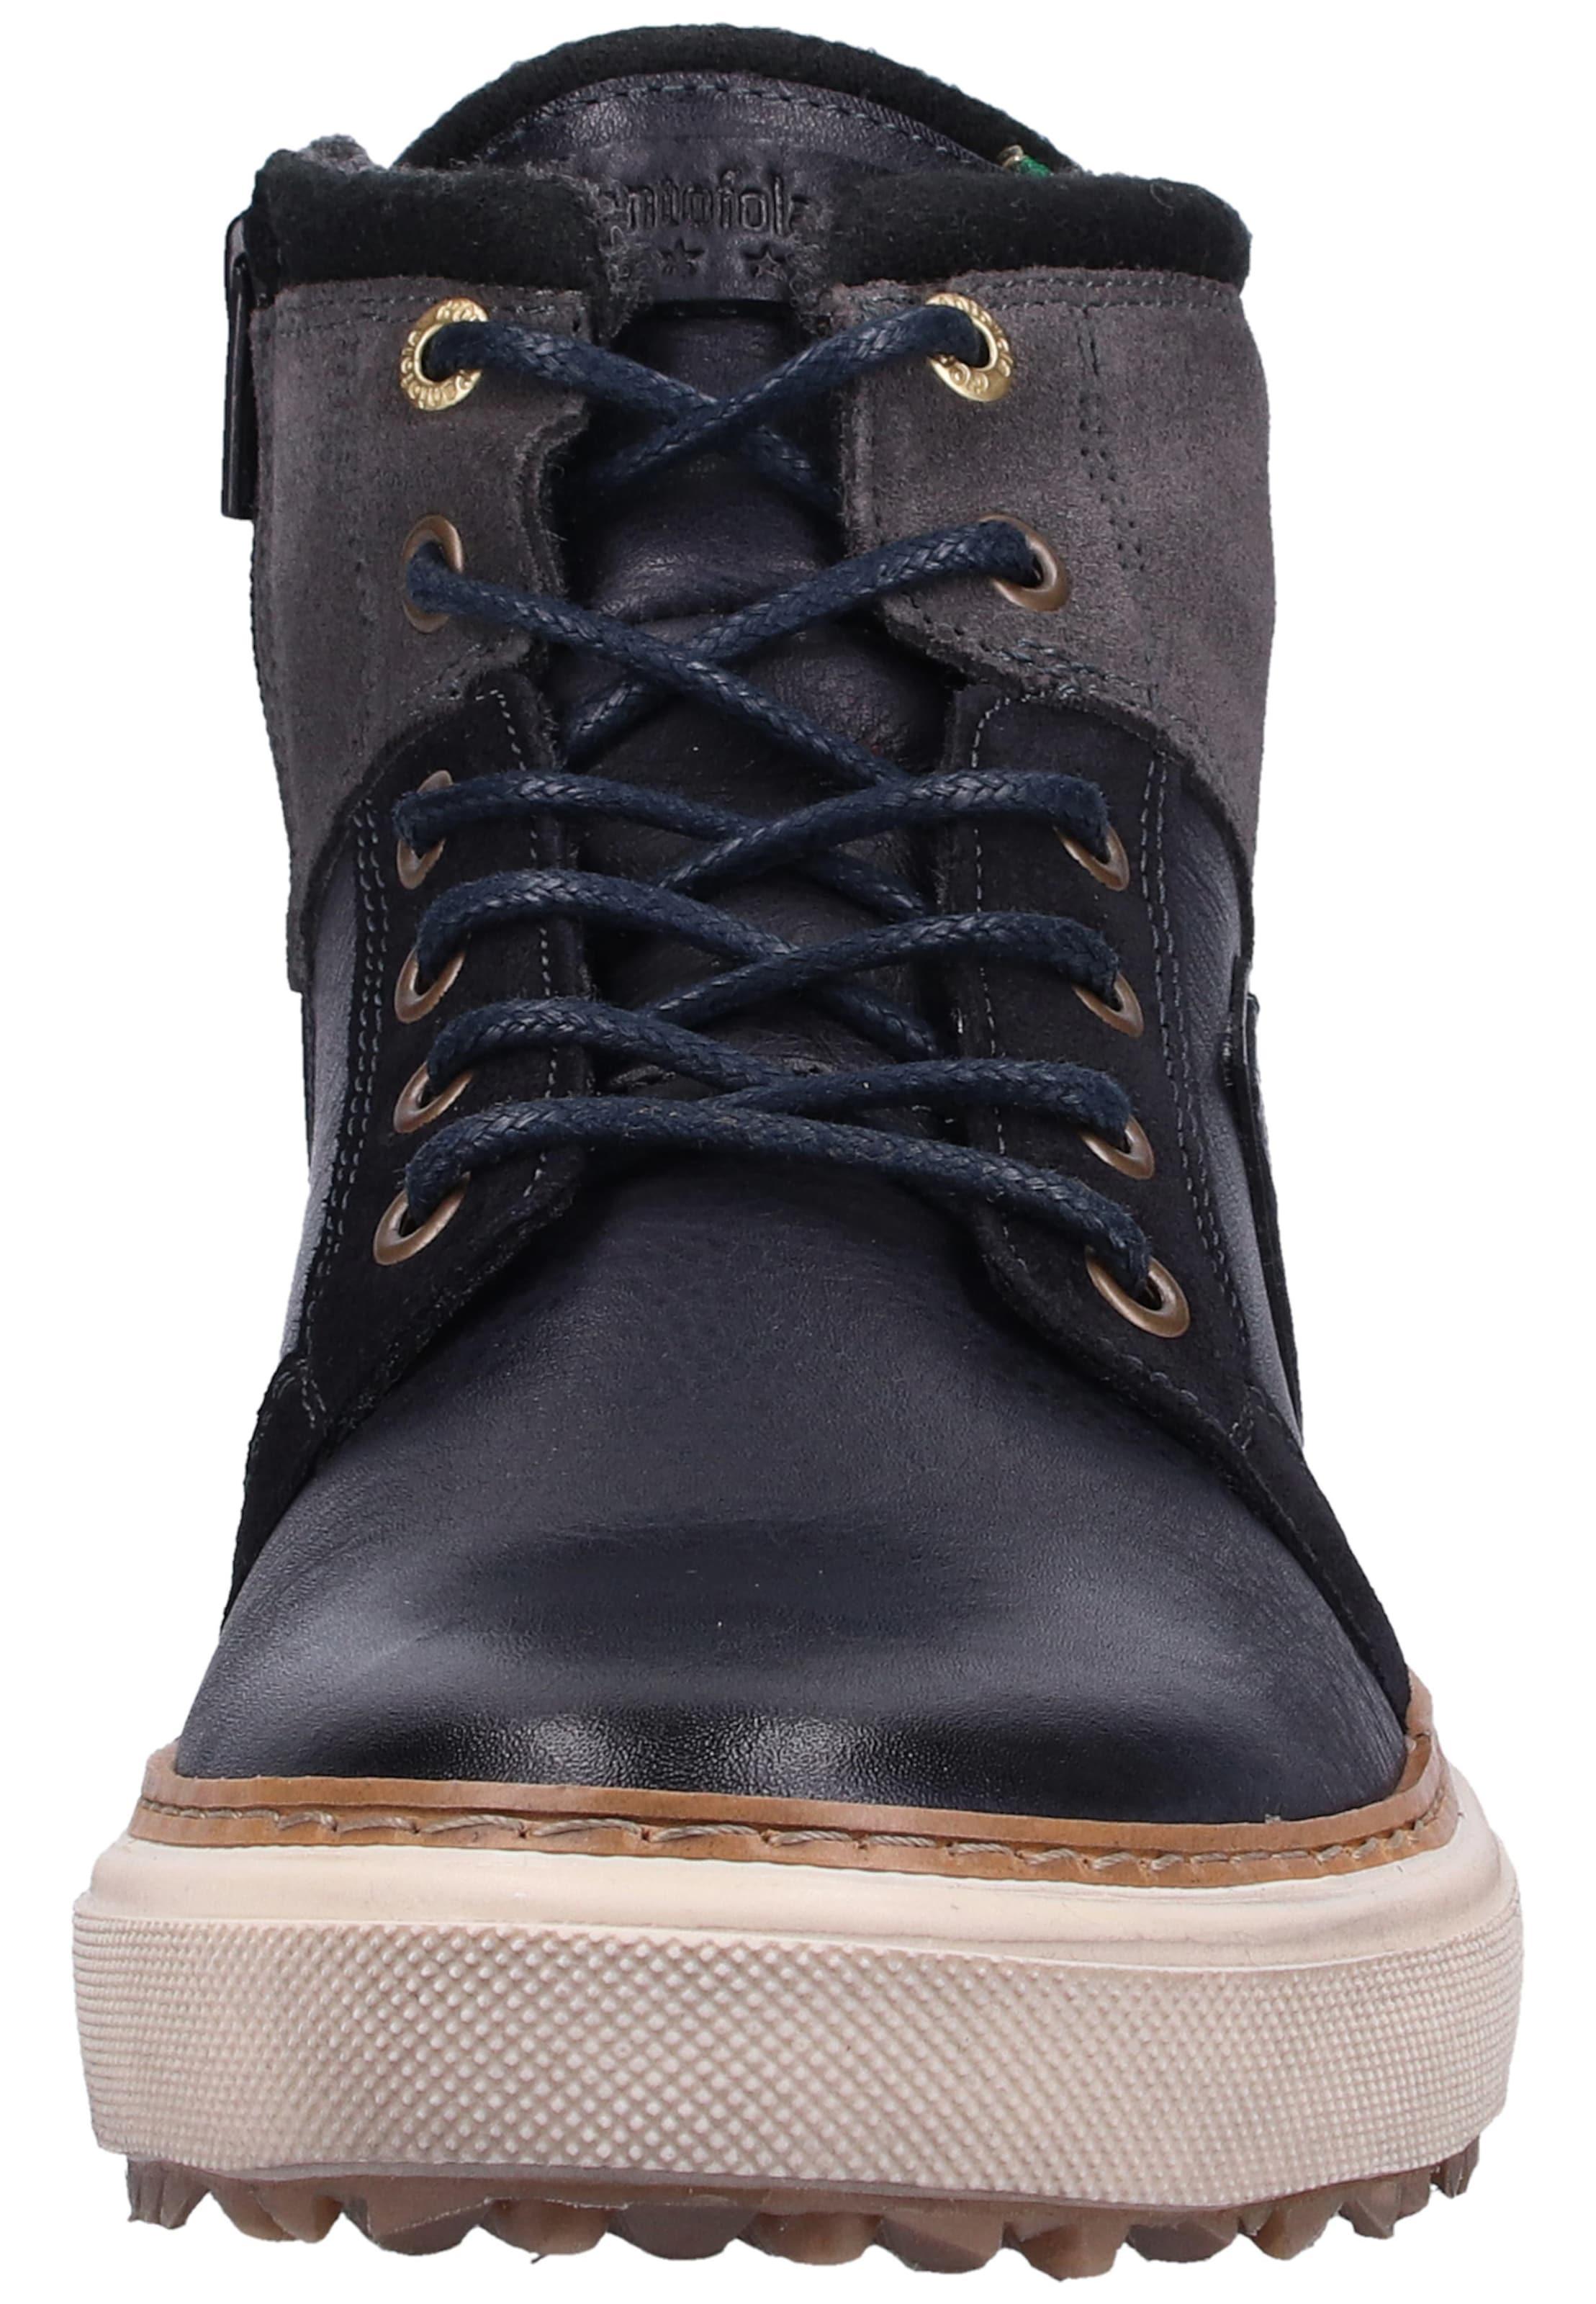 Sneaker D'oro KobaltblauDunkelblau Pantofola In XwOZPuTki